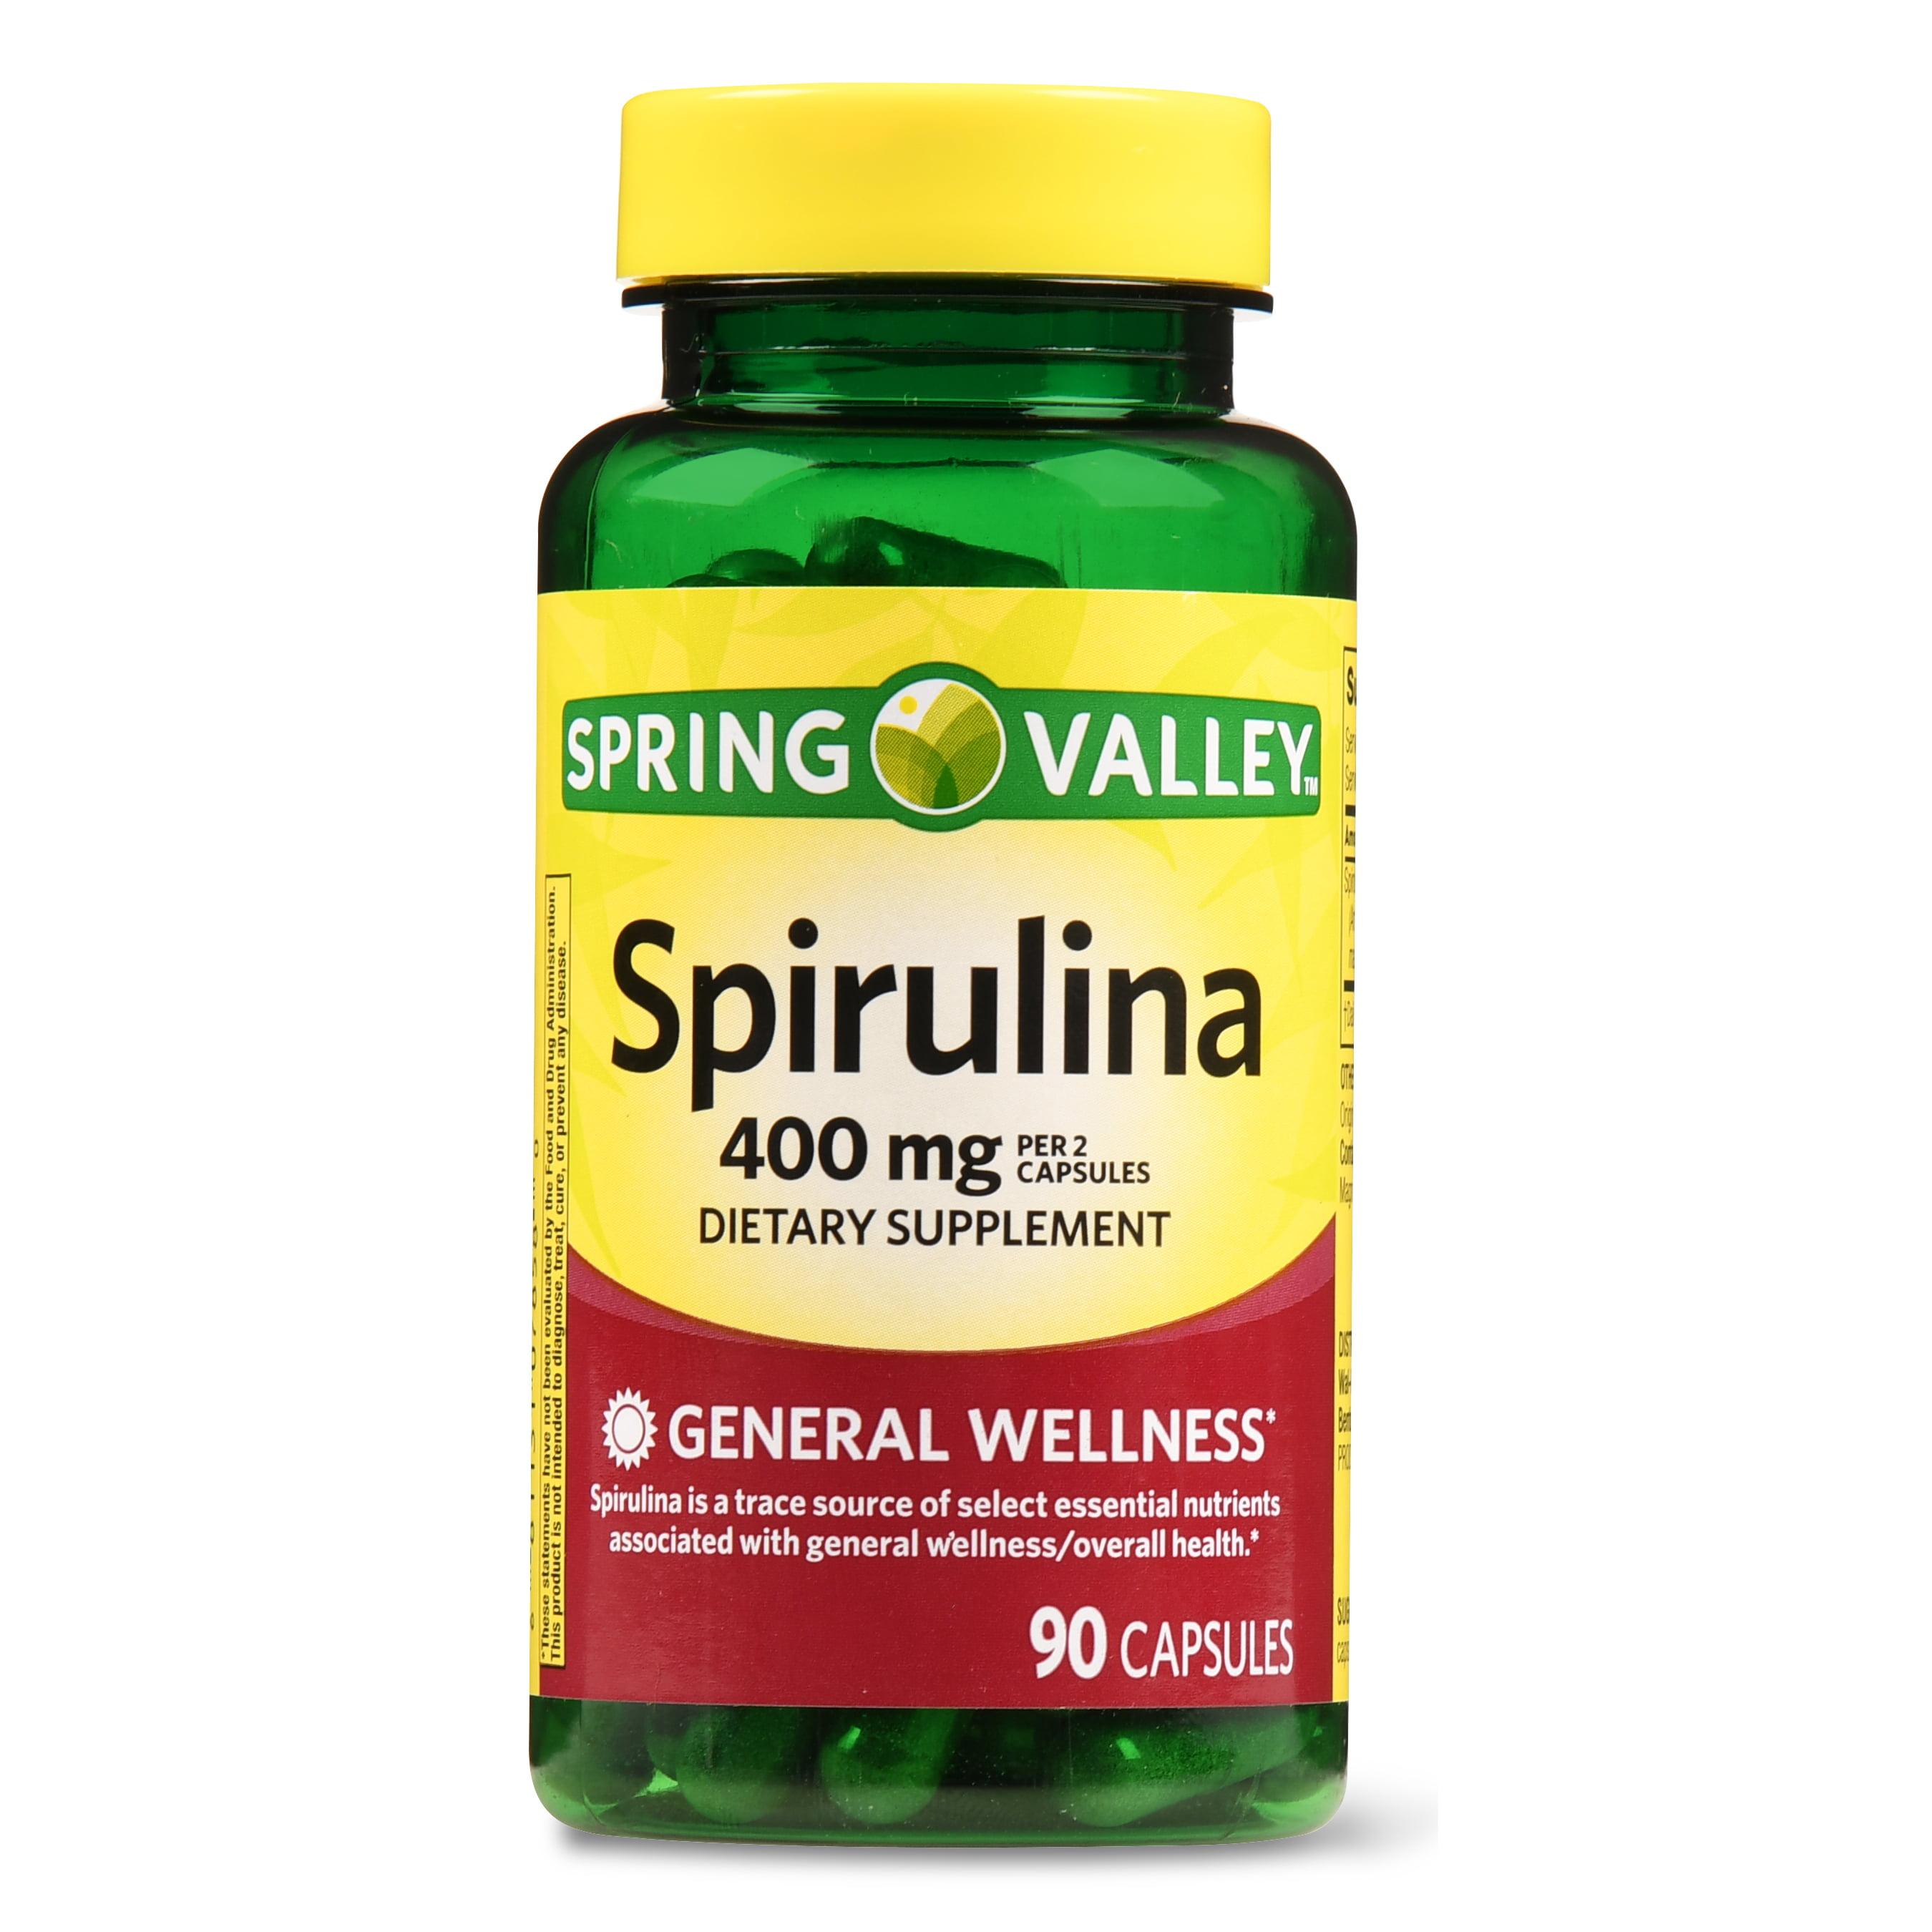 Spring Valley Spirulina Capsules, 400 mg, 90 Ct